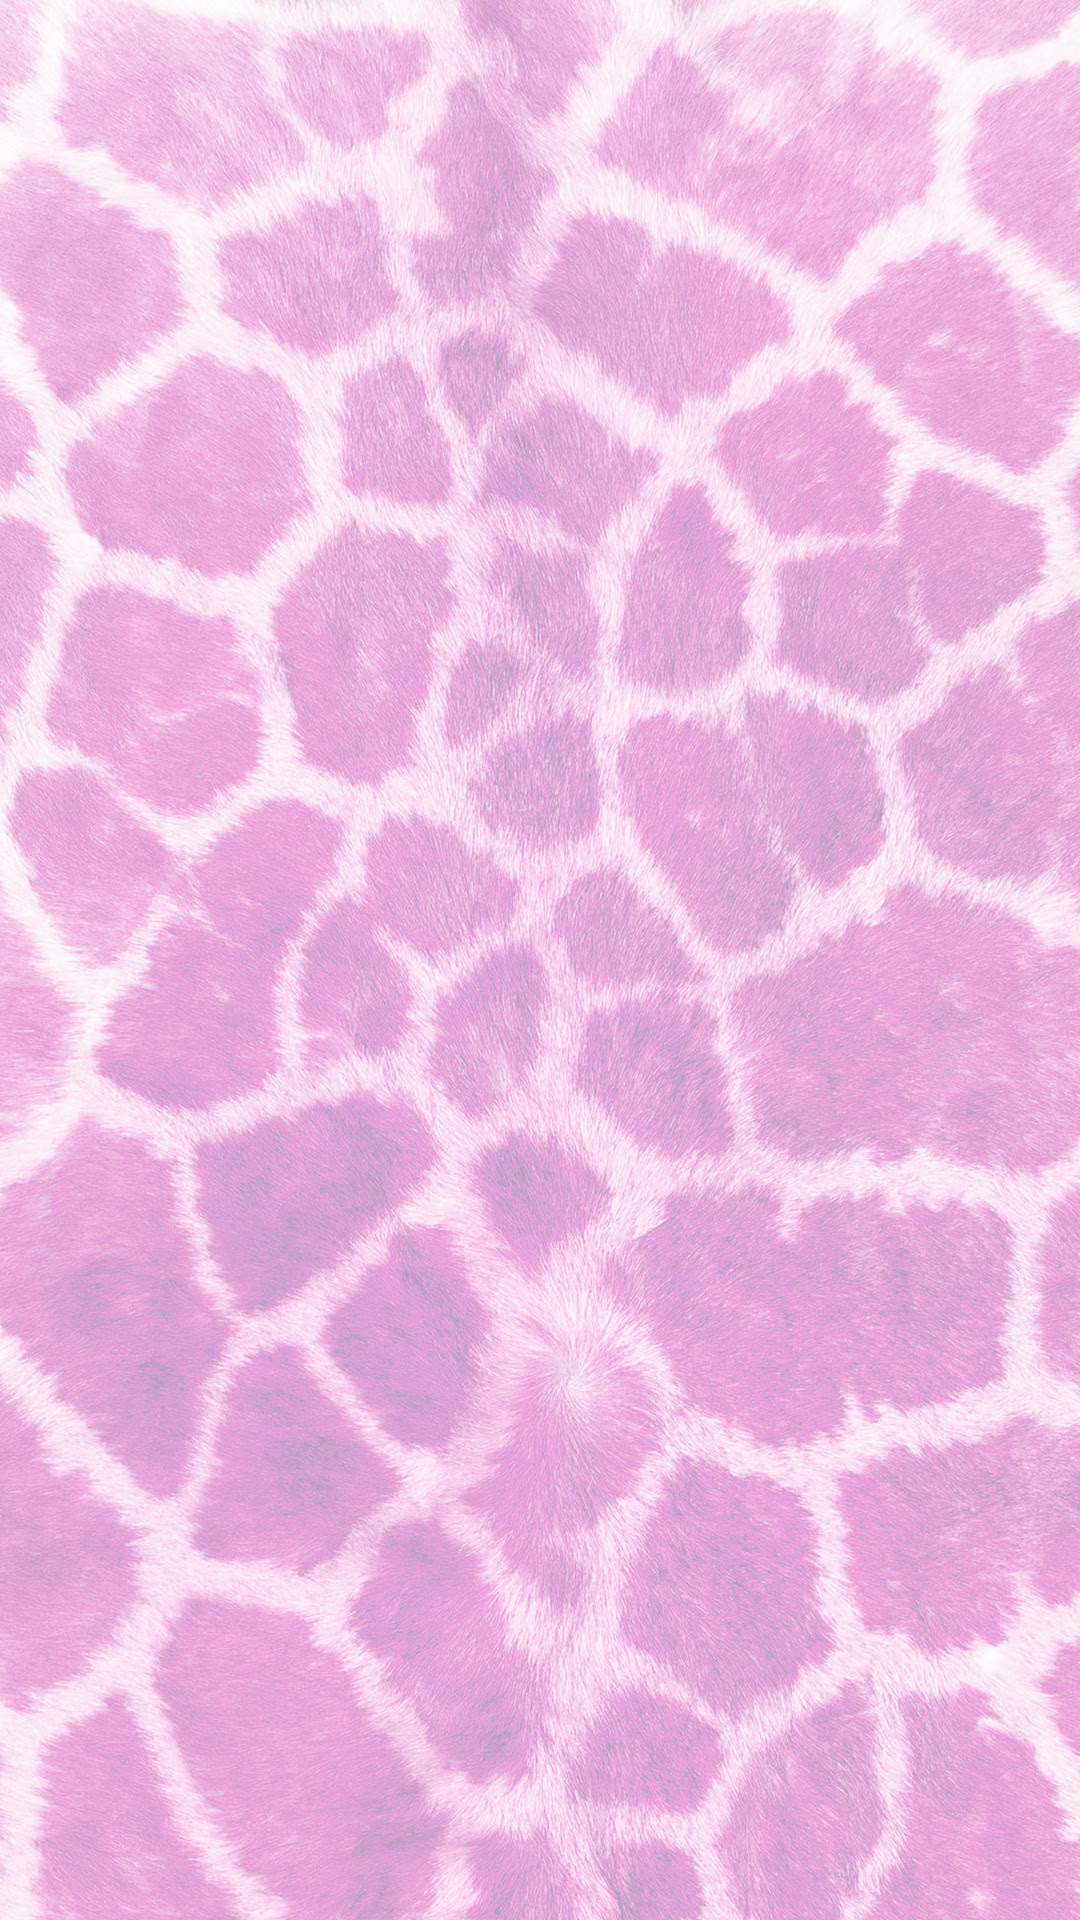 Pink Fur Wallpaper 53 Images